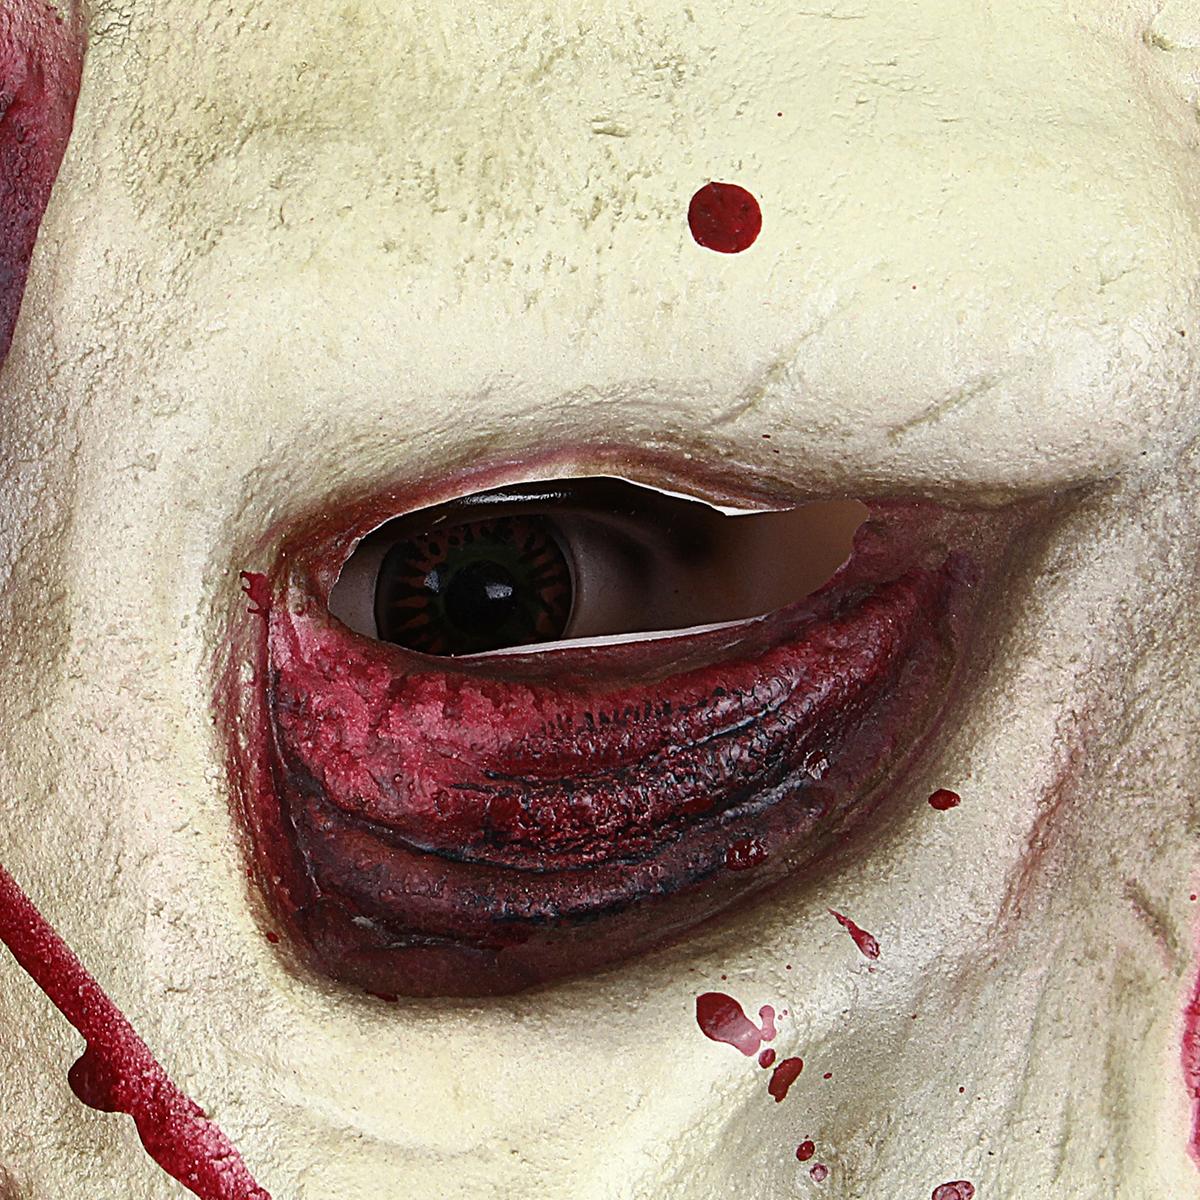 Scary Devil Zombie Latex Mask Halloween Cosplay Horror Monster Full Face Mask